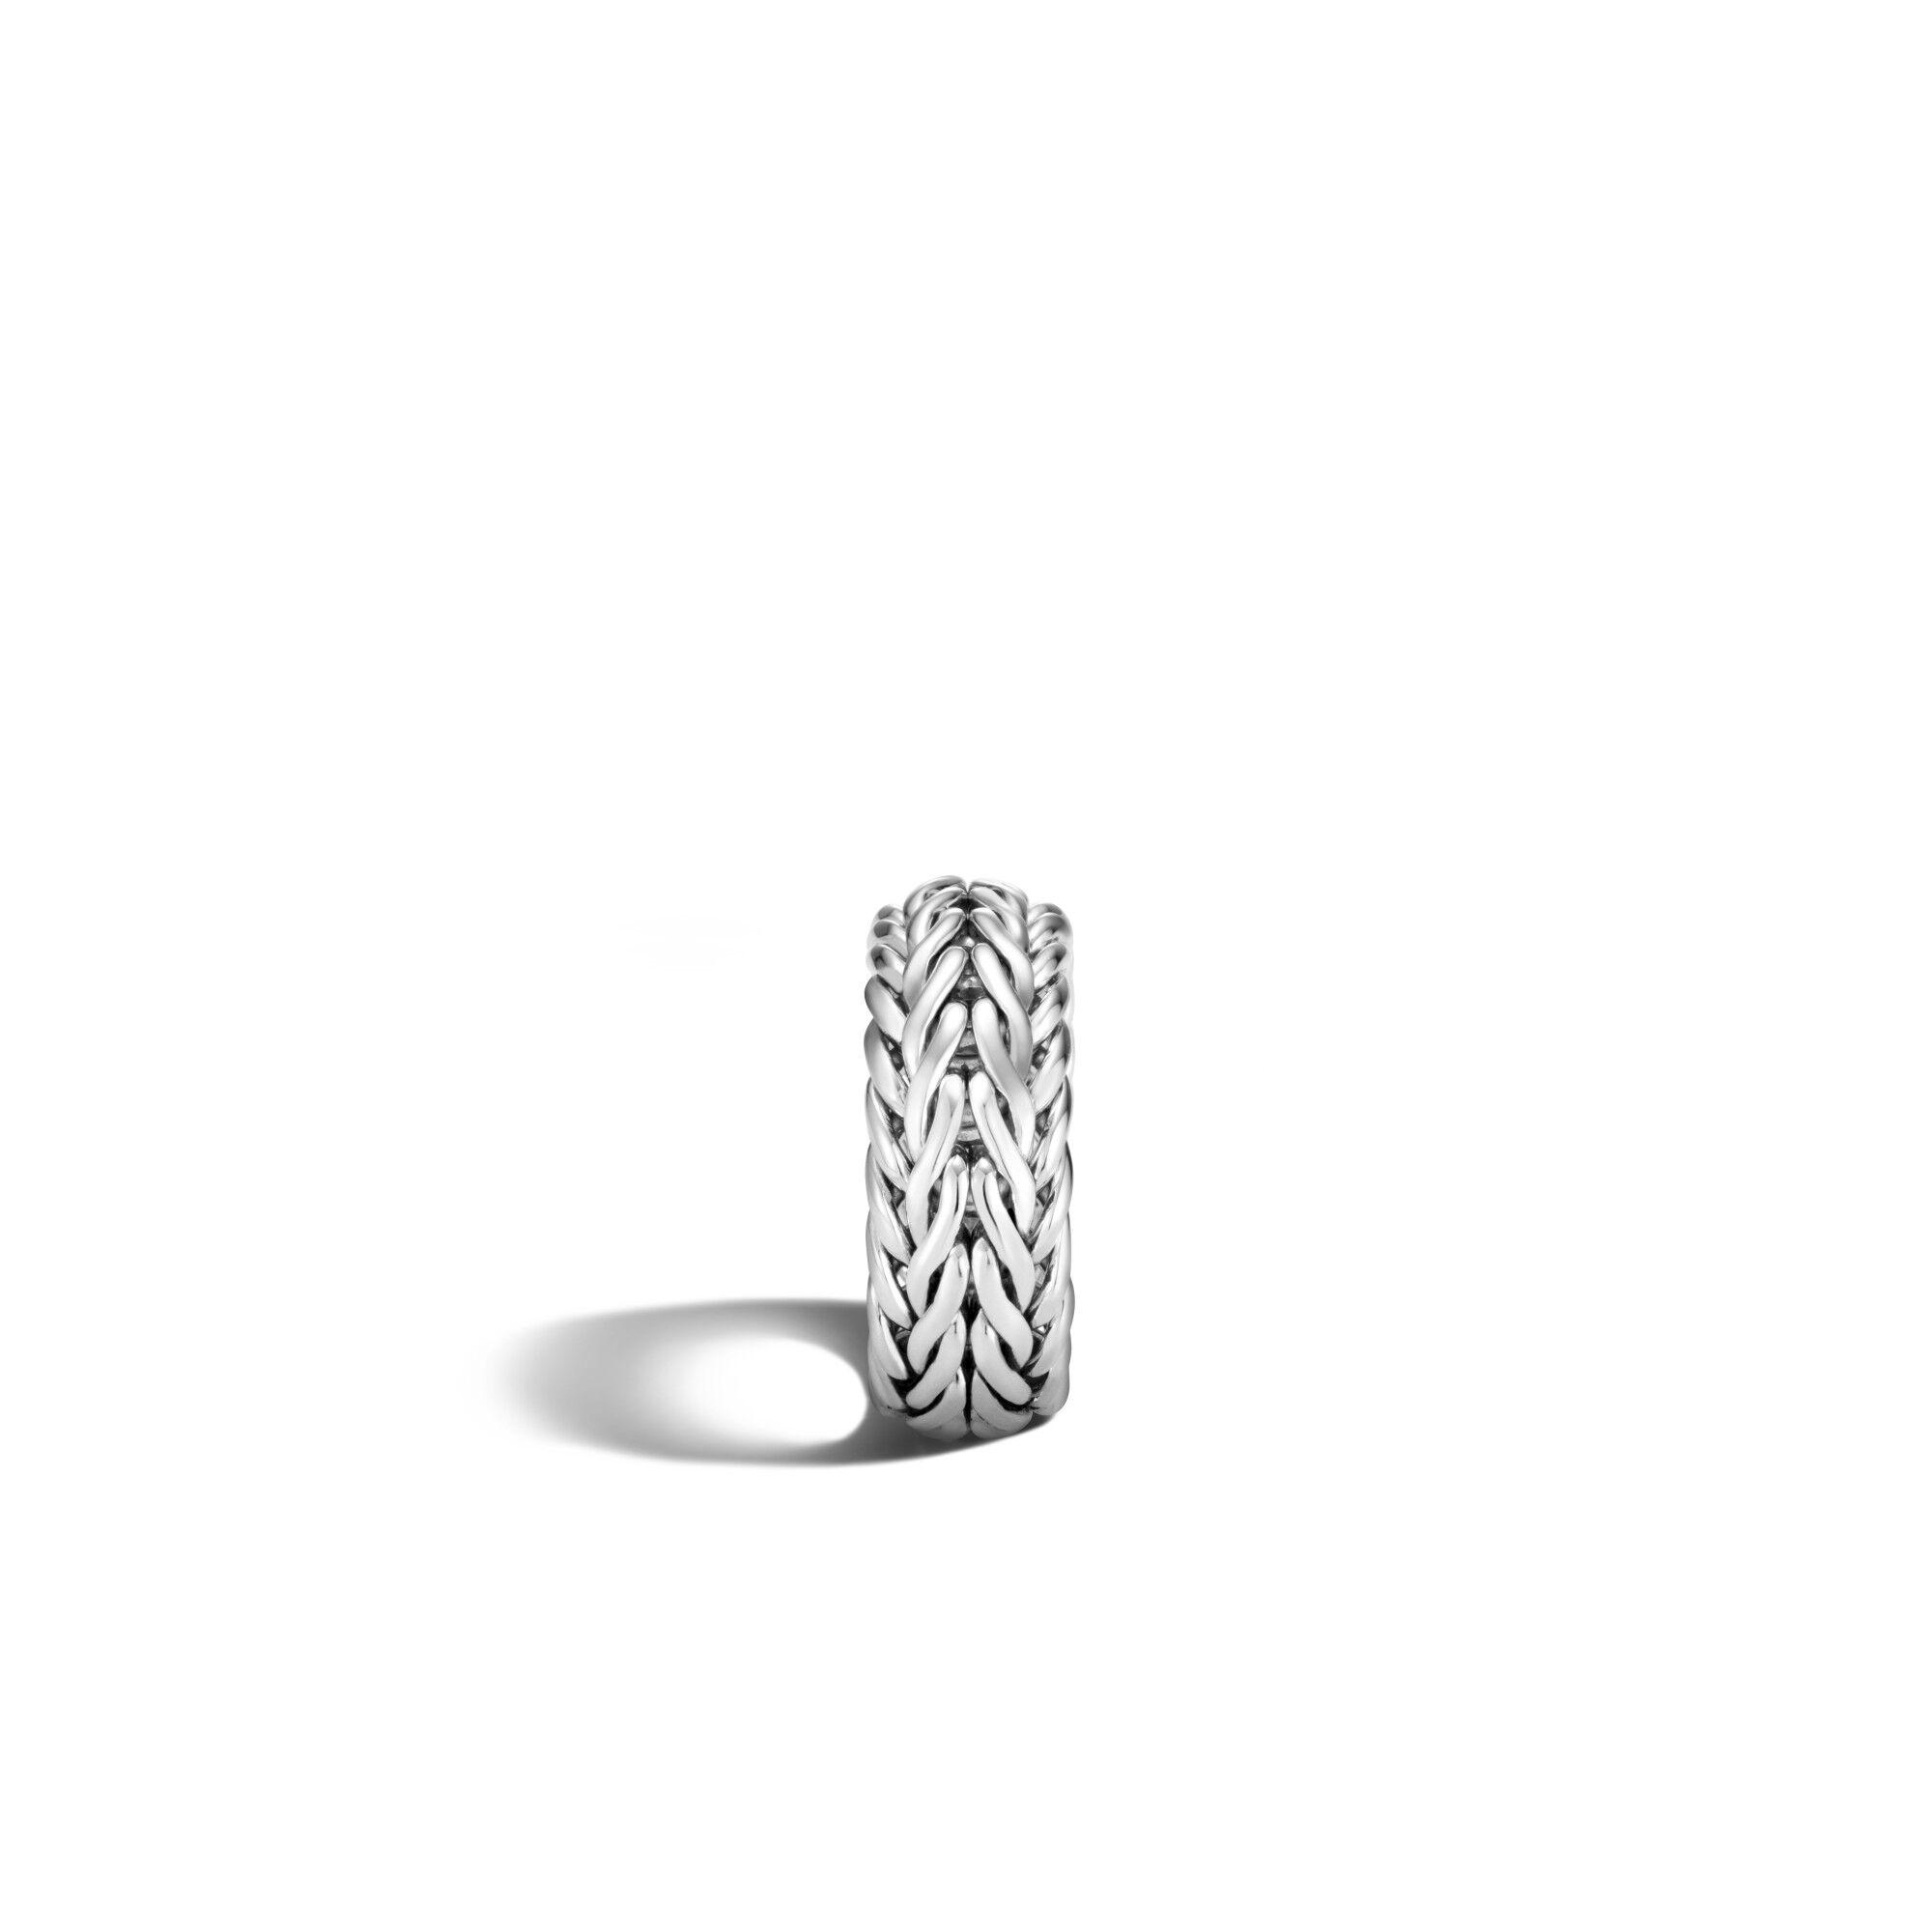 Kami Chain Band Ring, , large